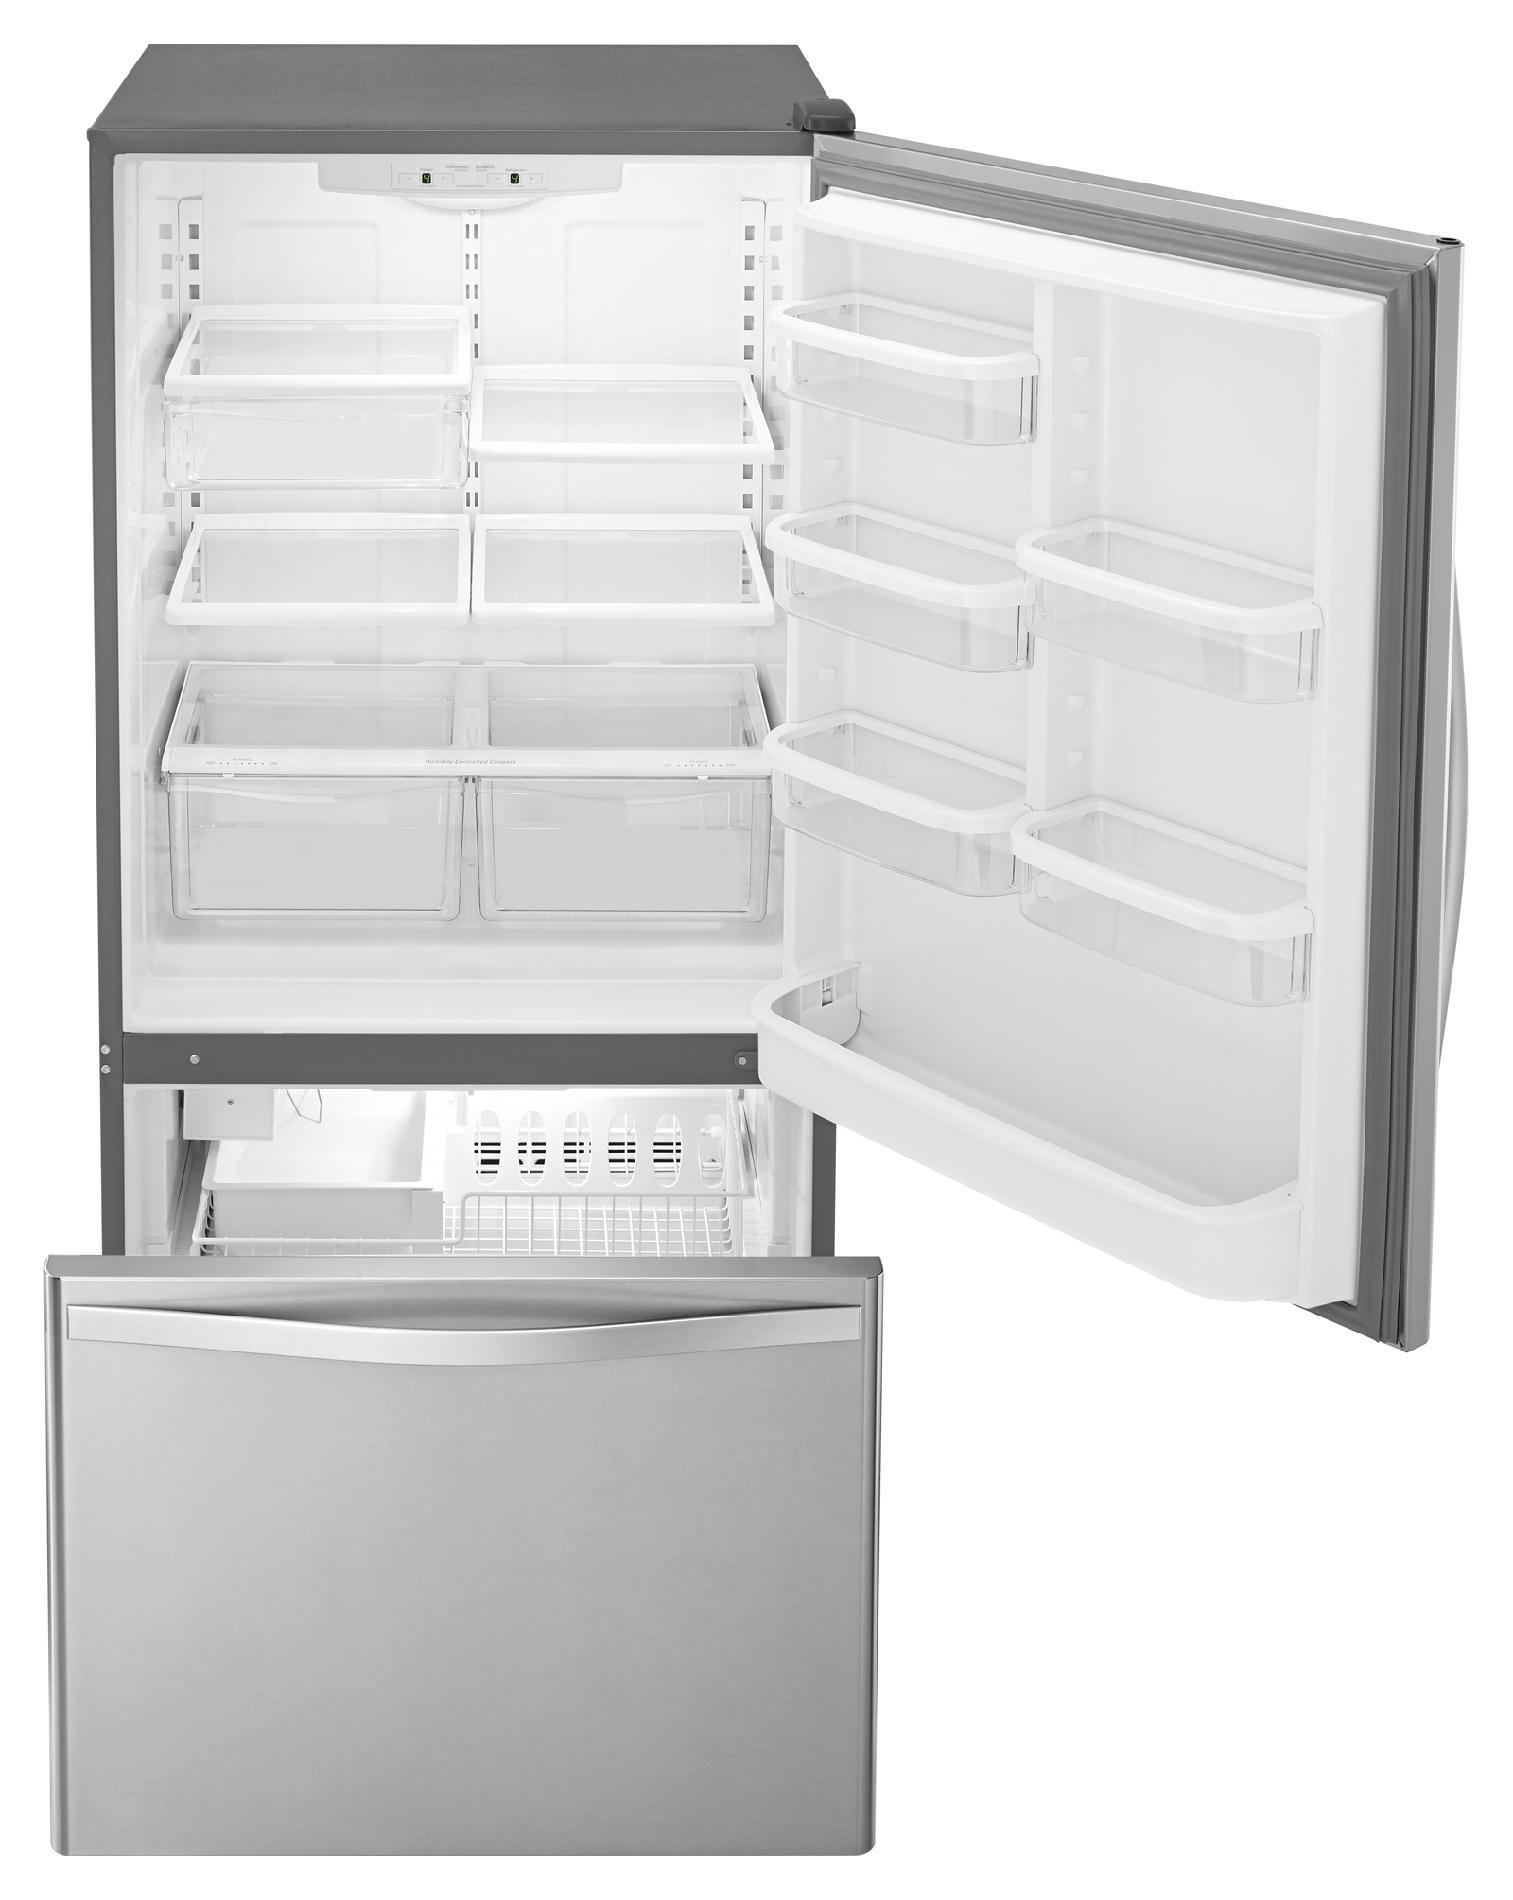 Whirlpool WRB322DMBM 22.1 cu. ft. Bottom-Freezer Refrigerator w/ Ice Maker - Stainless Steel